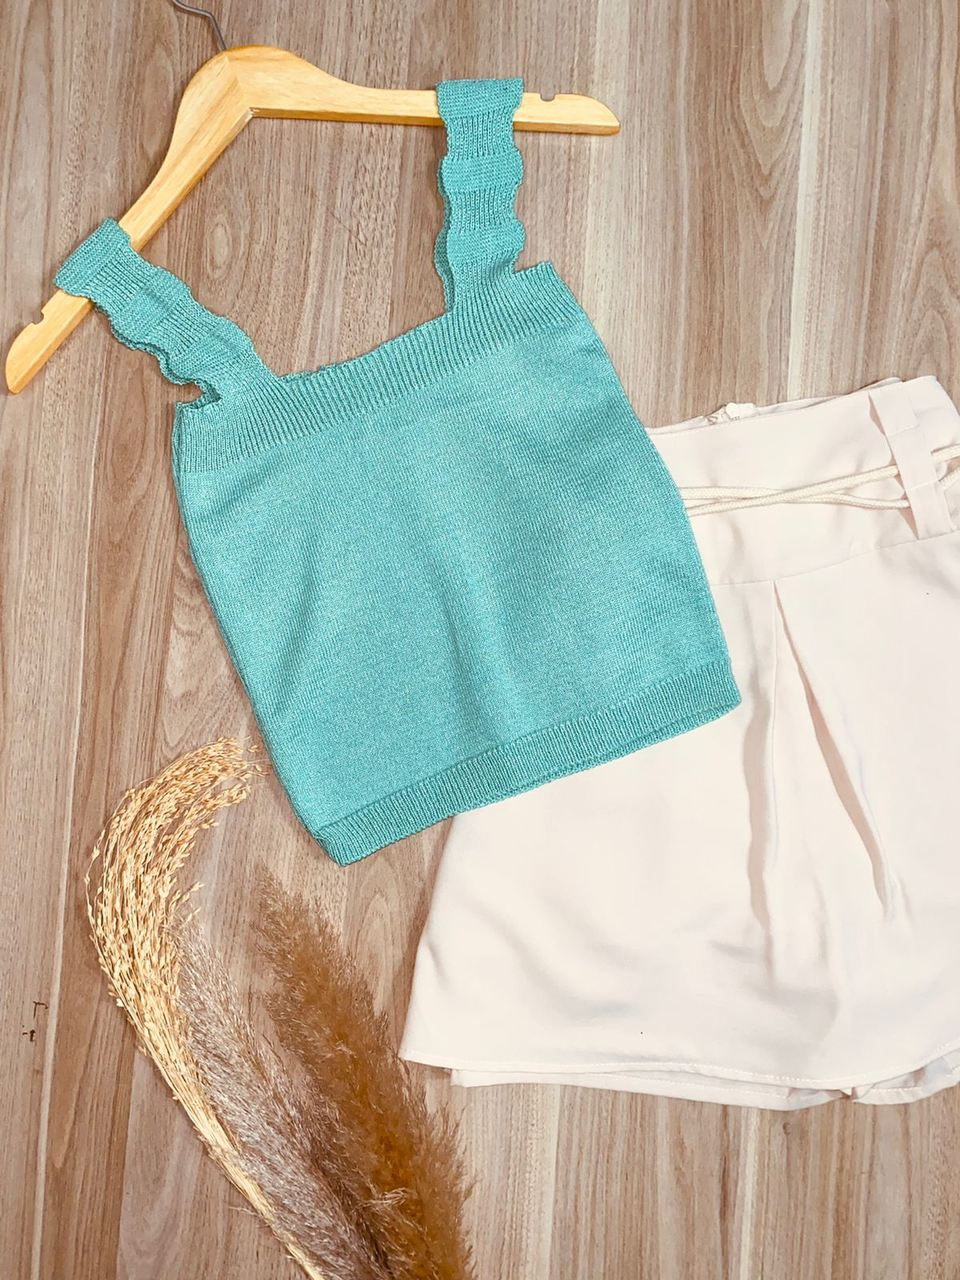 Blusa Cropped Modal com Detalhes na Alça Karina Fashion